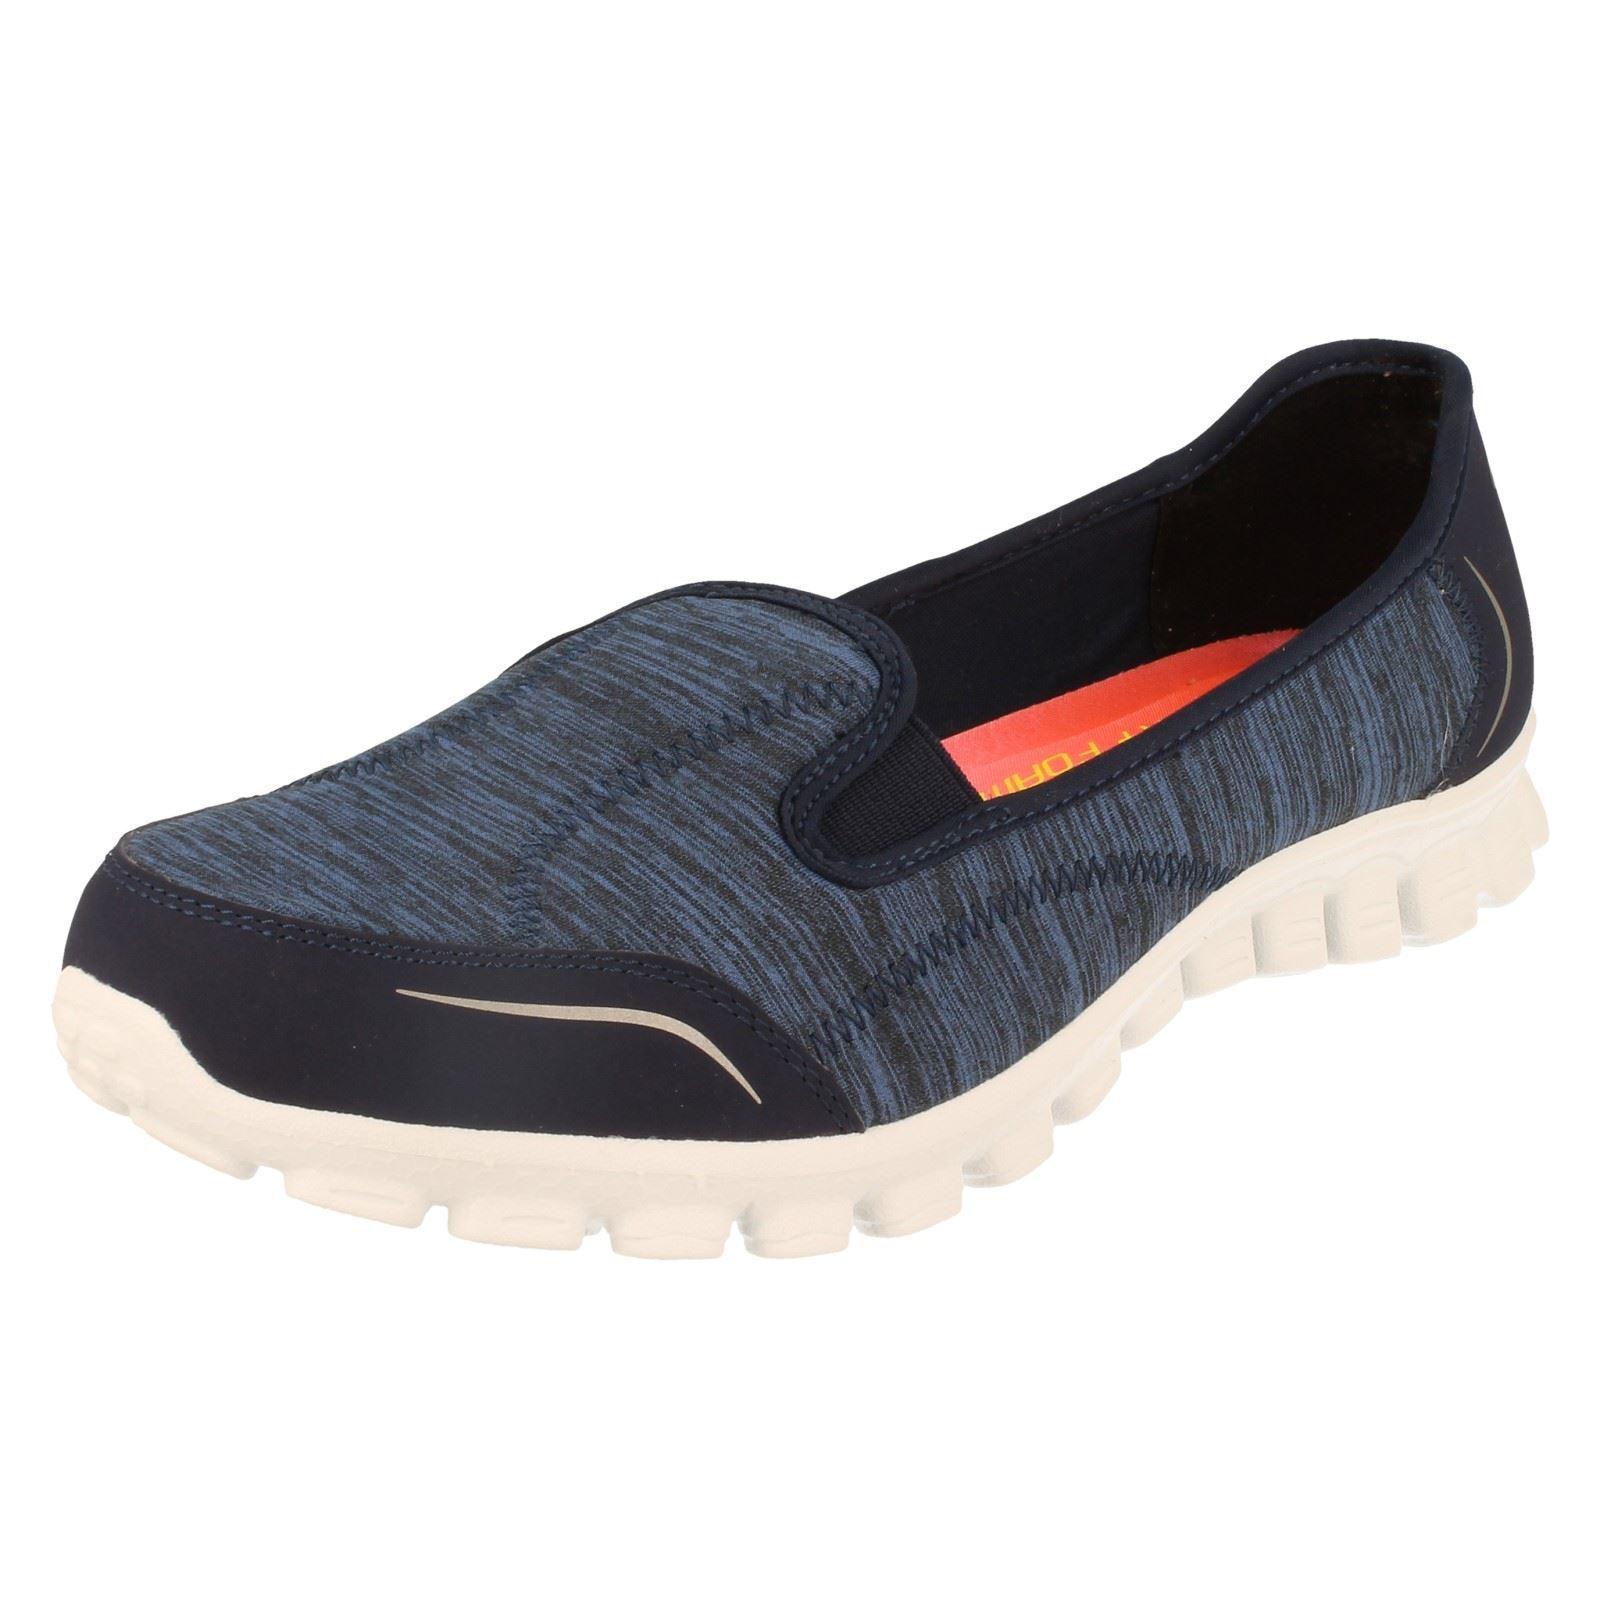 LADIES SKECHERS EZ FLEX 2 ENCOUNTER SLIP ON MEMORY FOAM TRAINERS Schuhe 22641